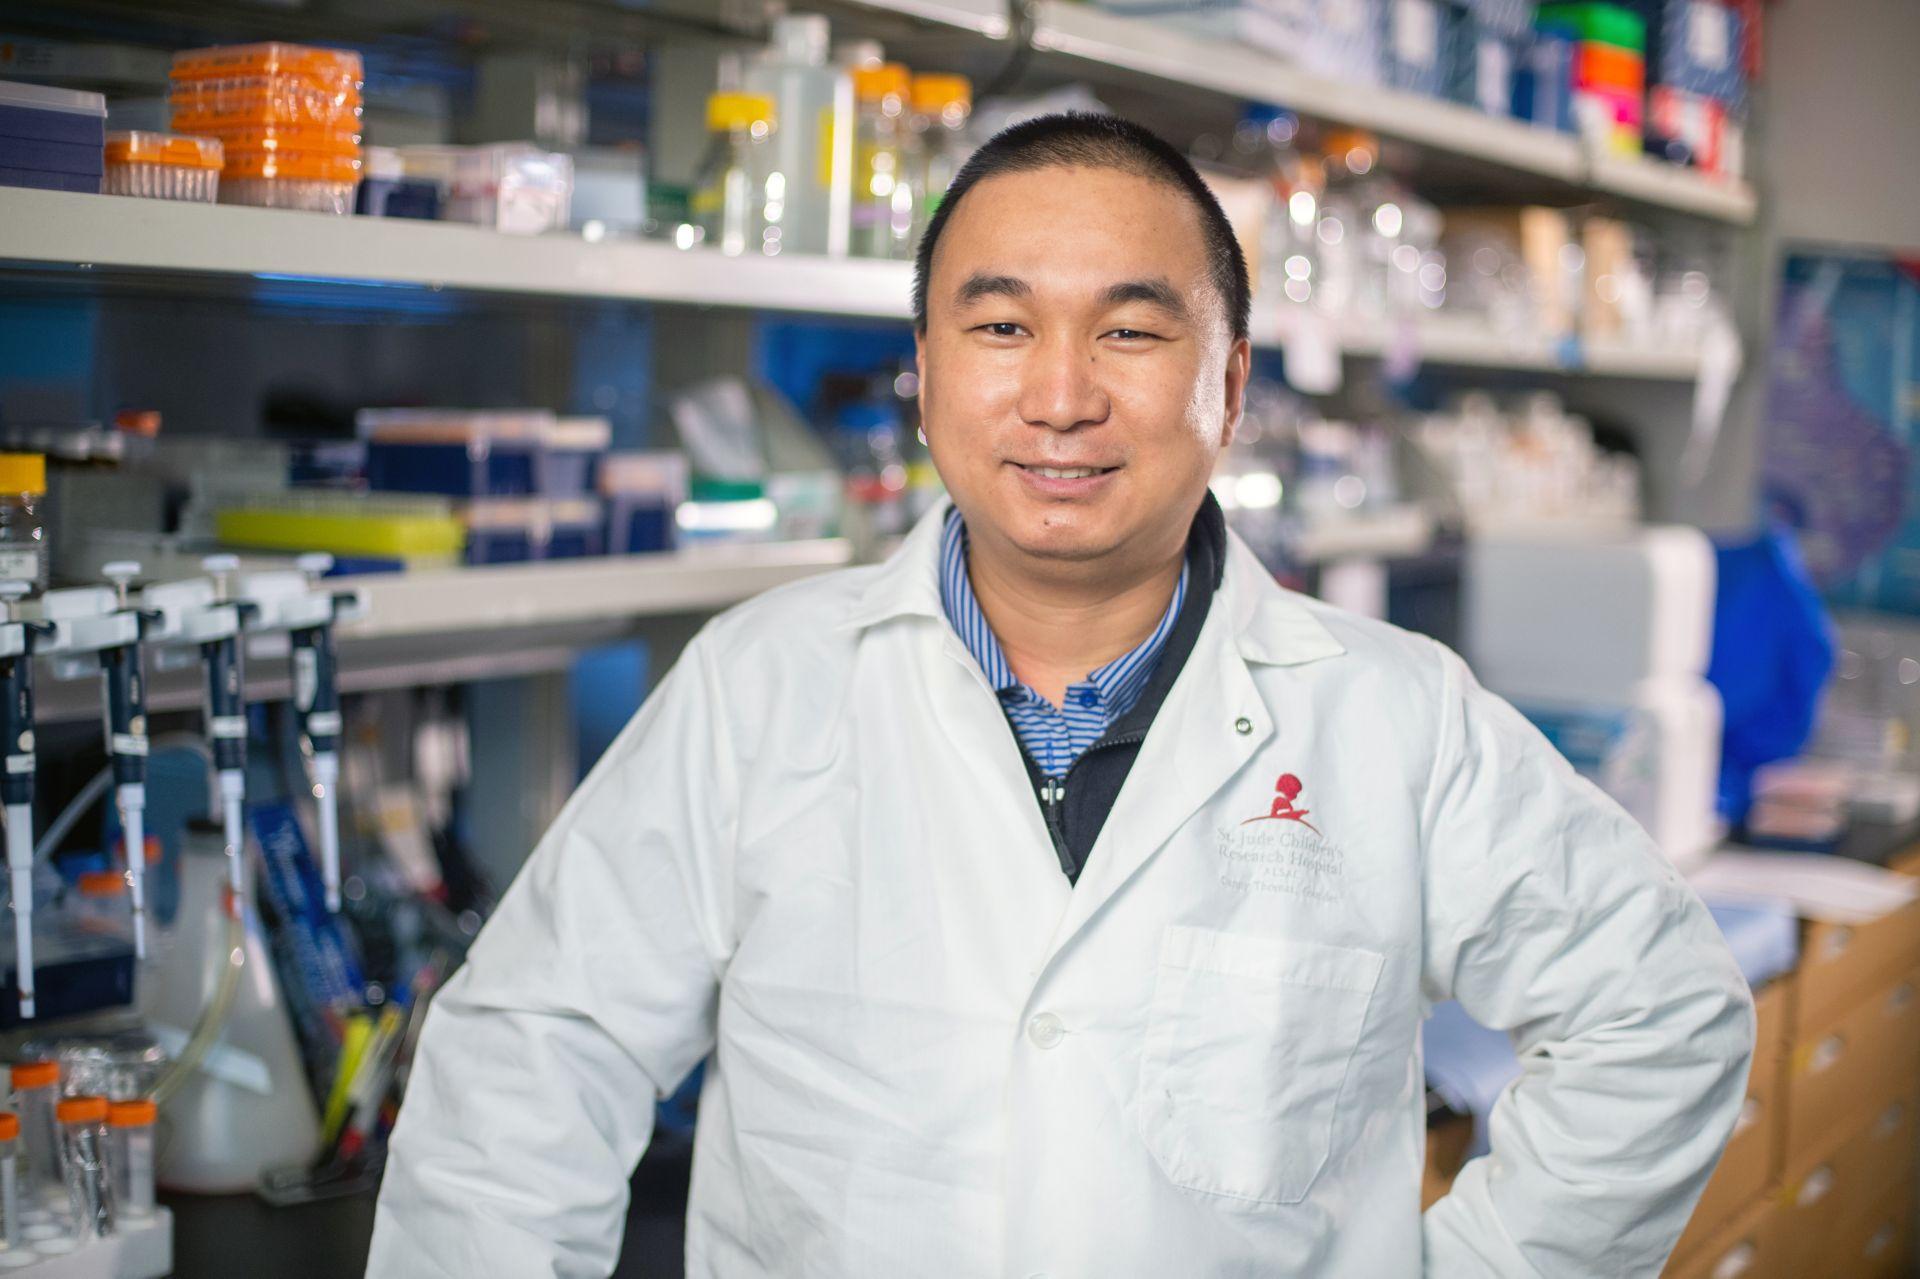 Xiaojun Sun, PhD